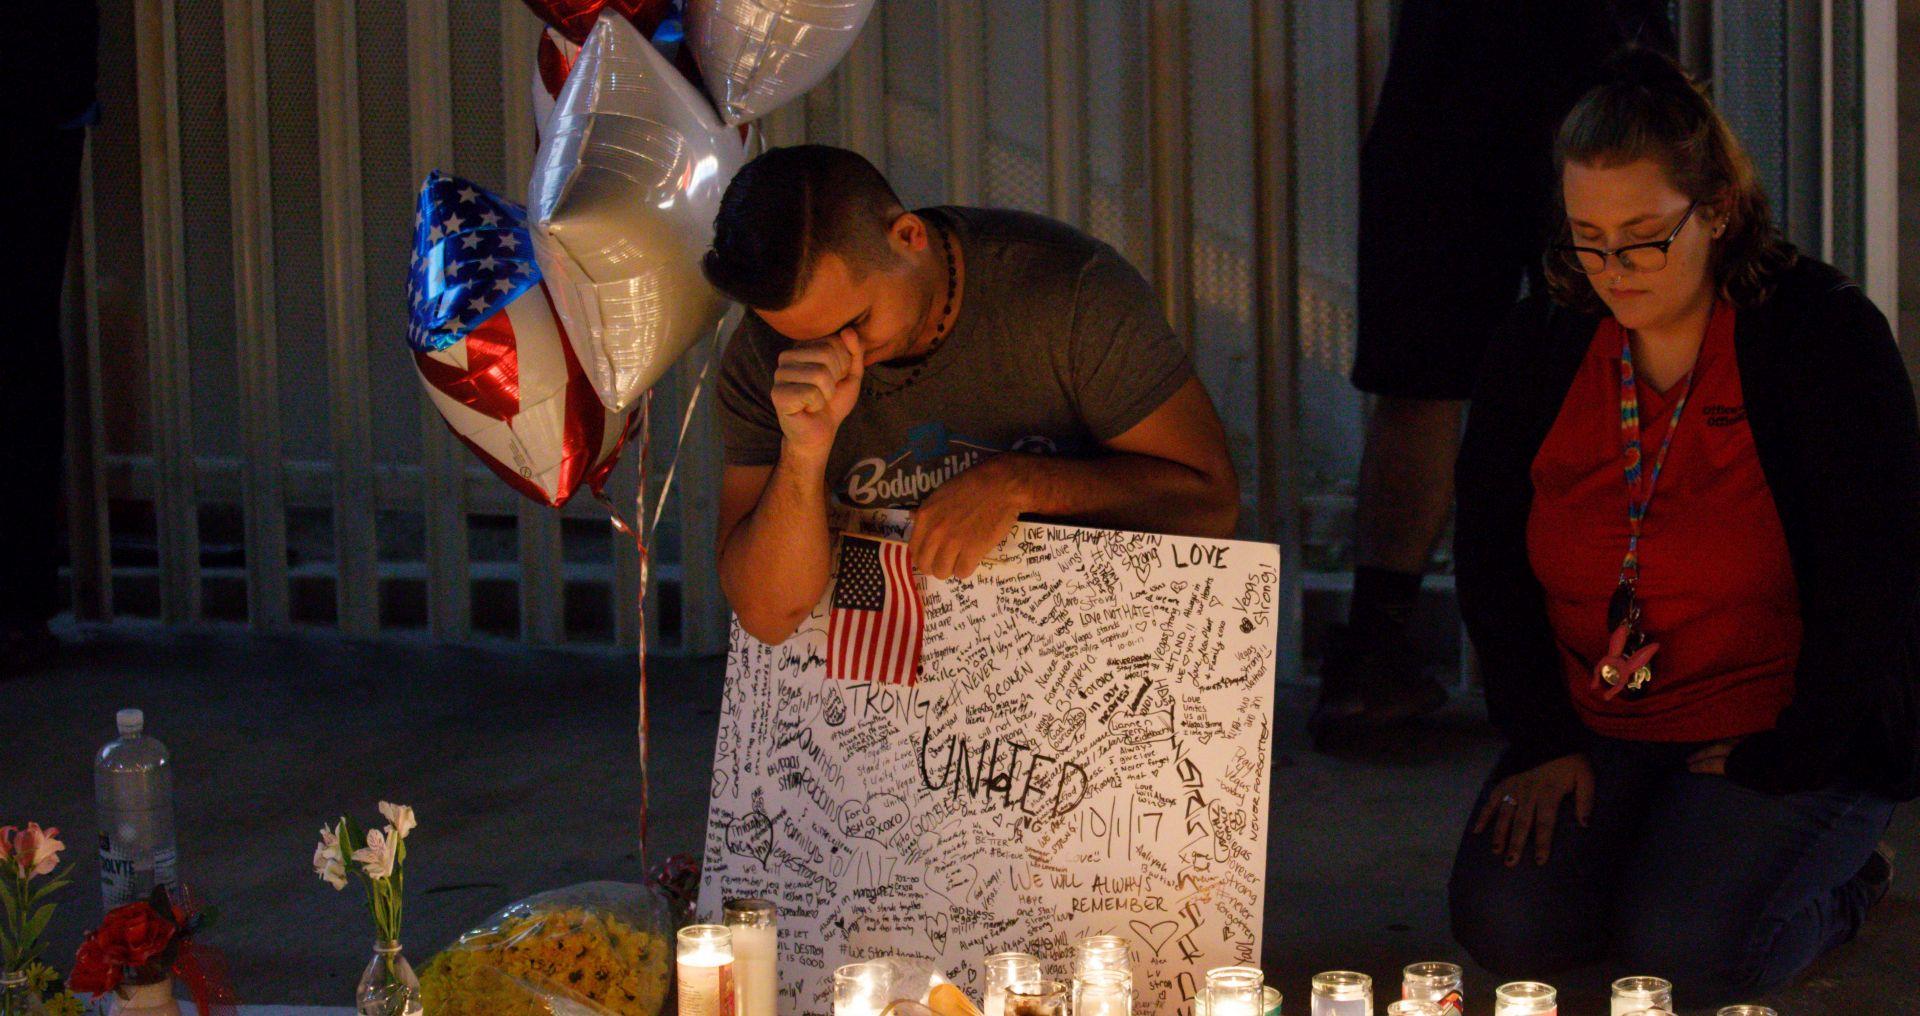 PREDSJEDNIK TRUMP: Ubojica iz Las Vegasa bio je bolesnik, luđak, istražujemo ga jako ozbiljno…